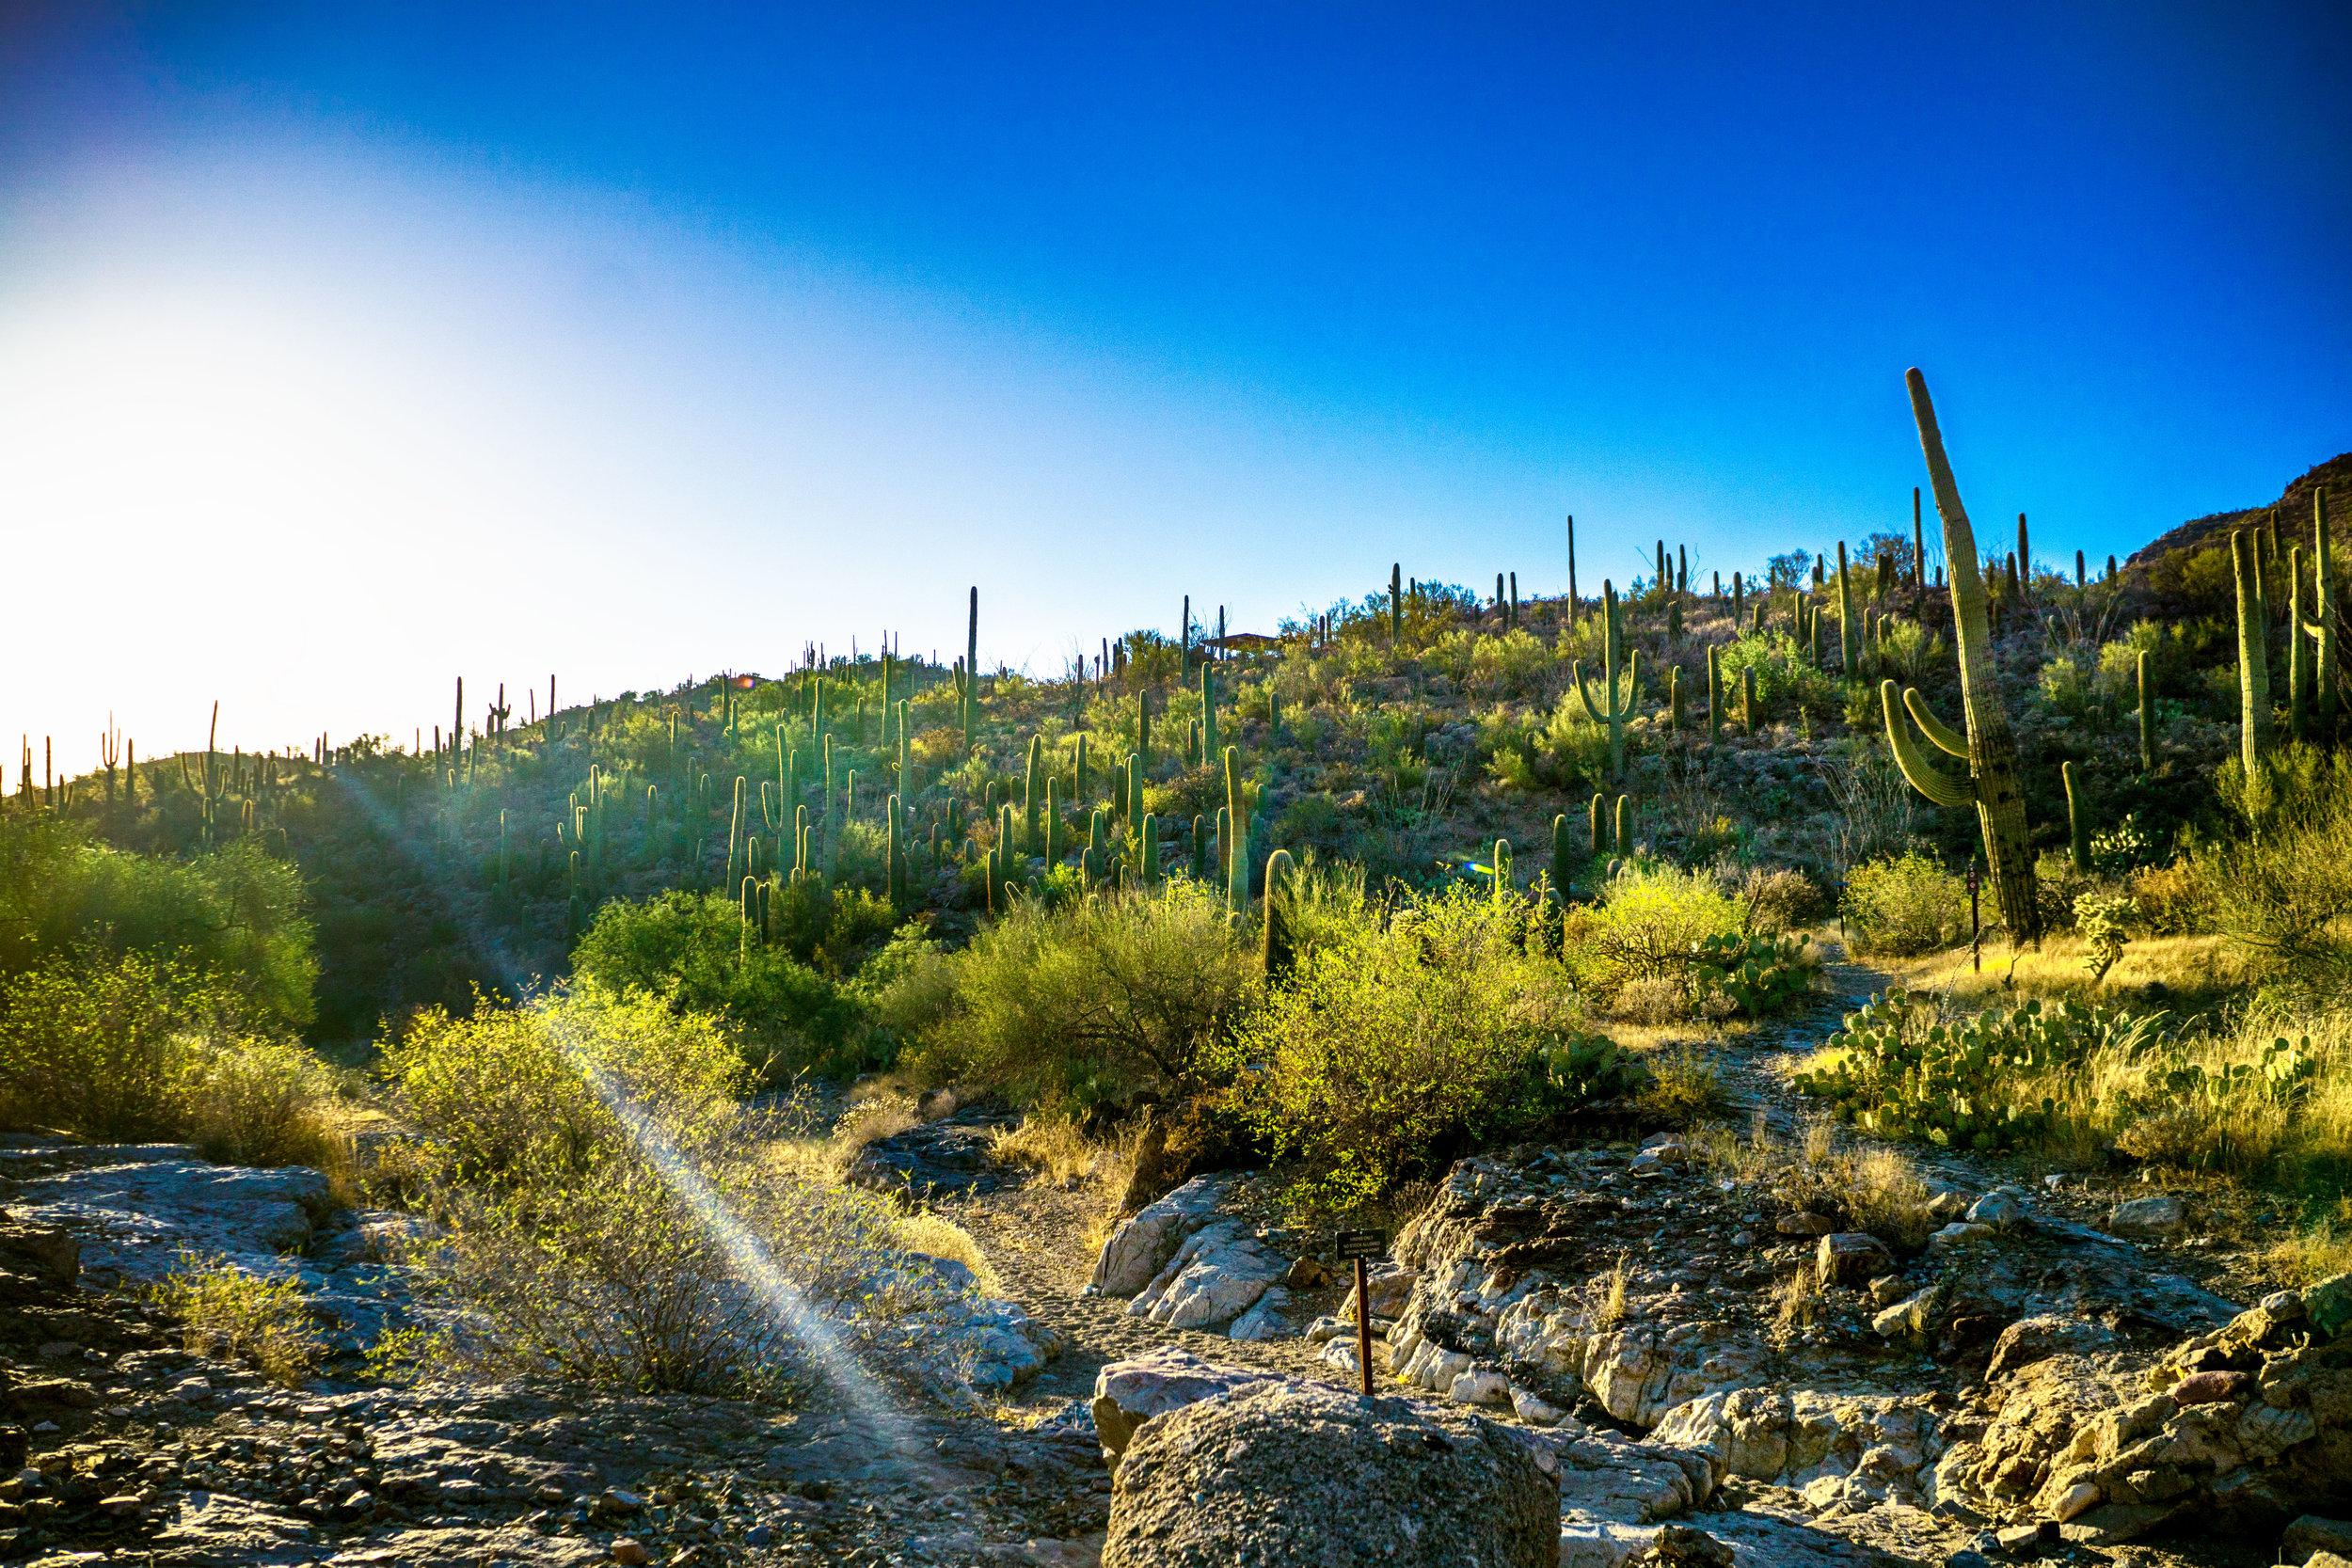 vickygood_photography_nature_saguaro-park4.jpg